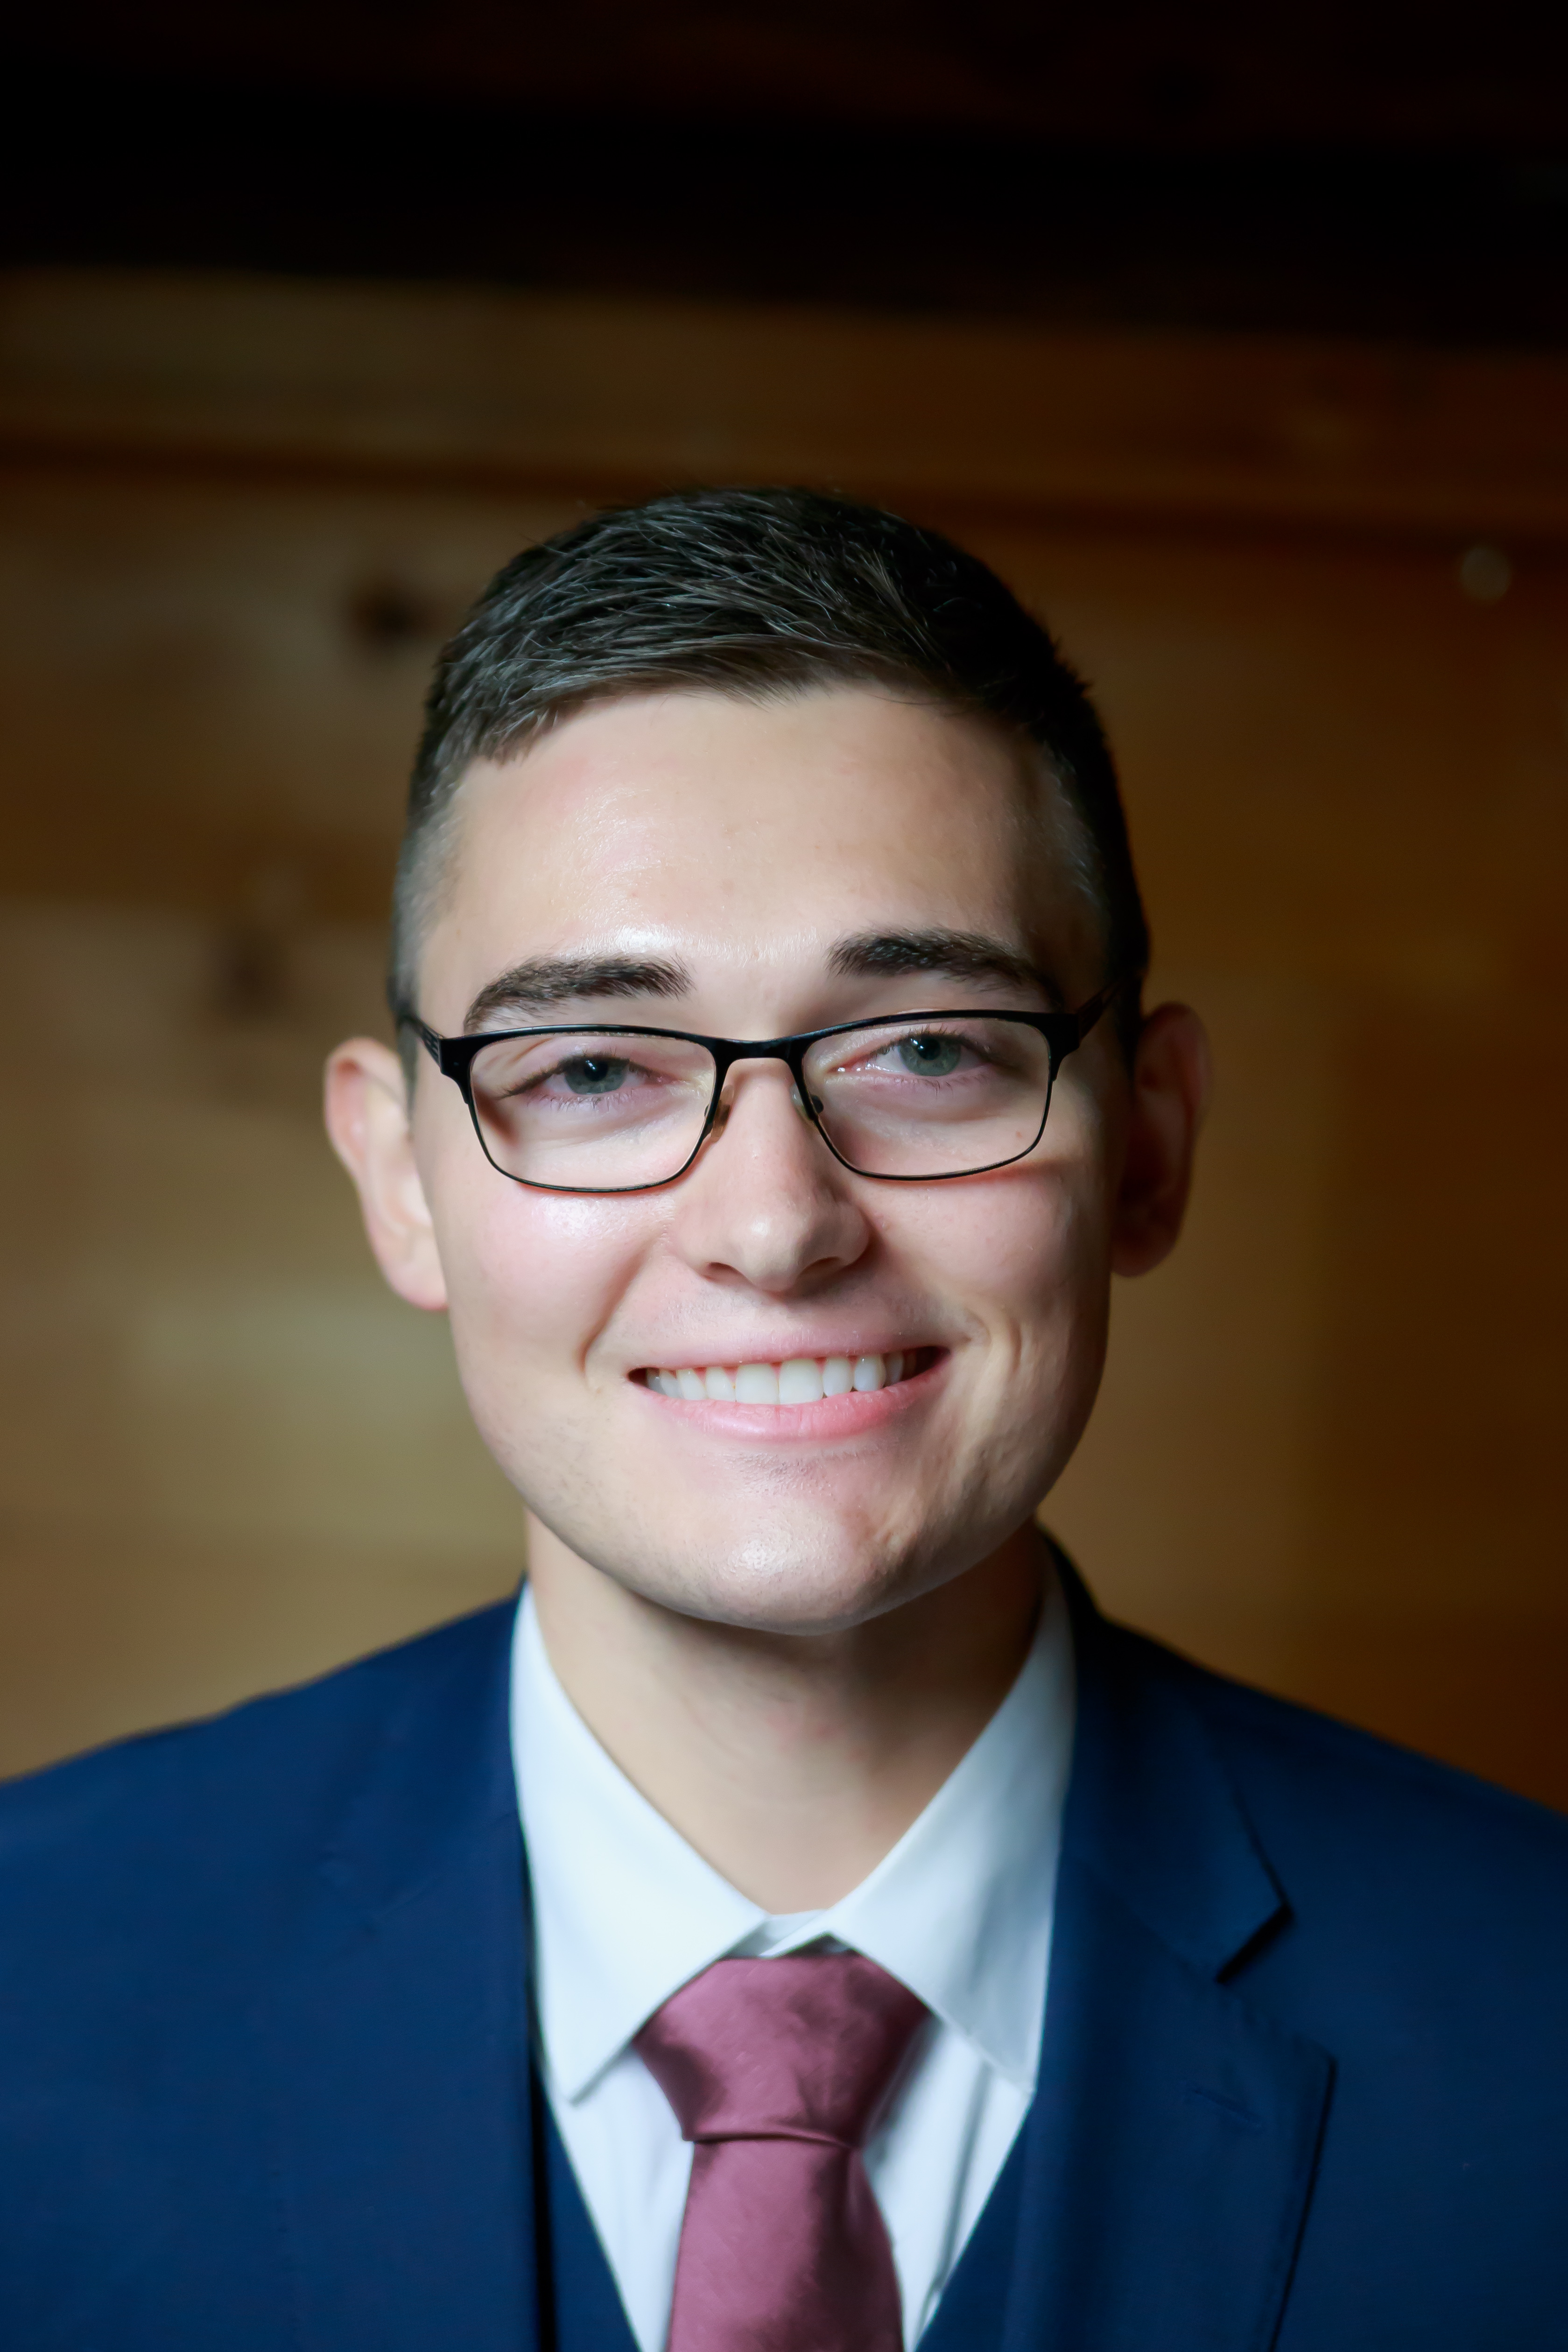 Jacob Devries   Health and Life Insurance Agent   Grandville, MI 49418